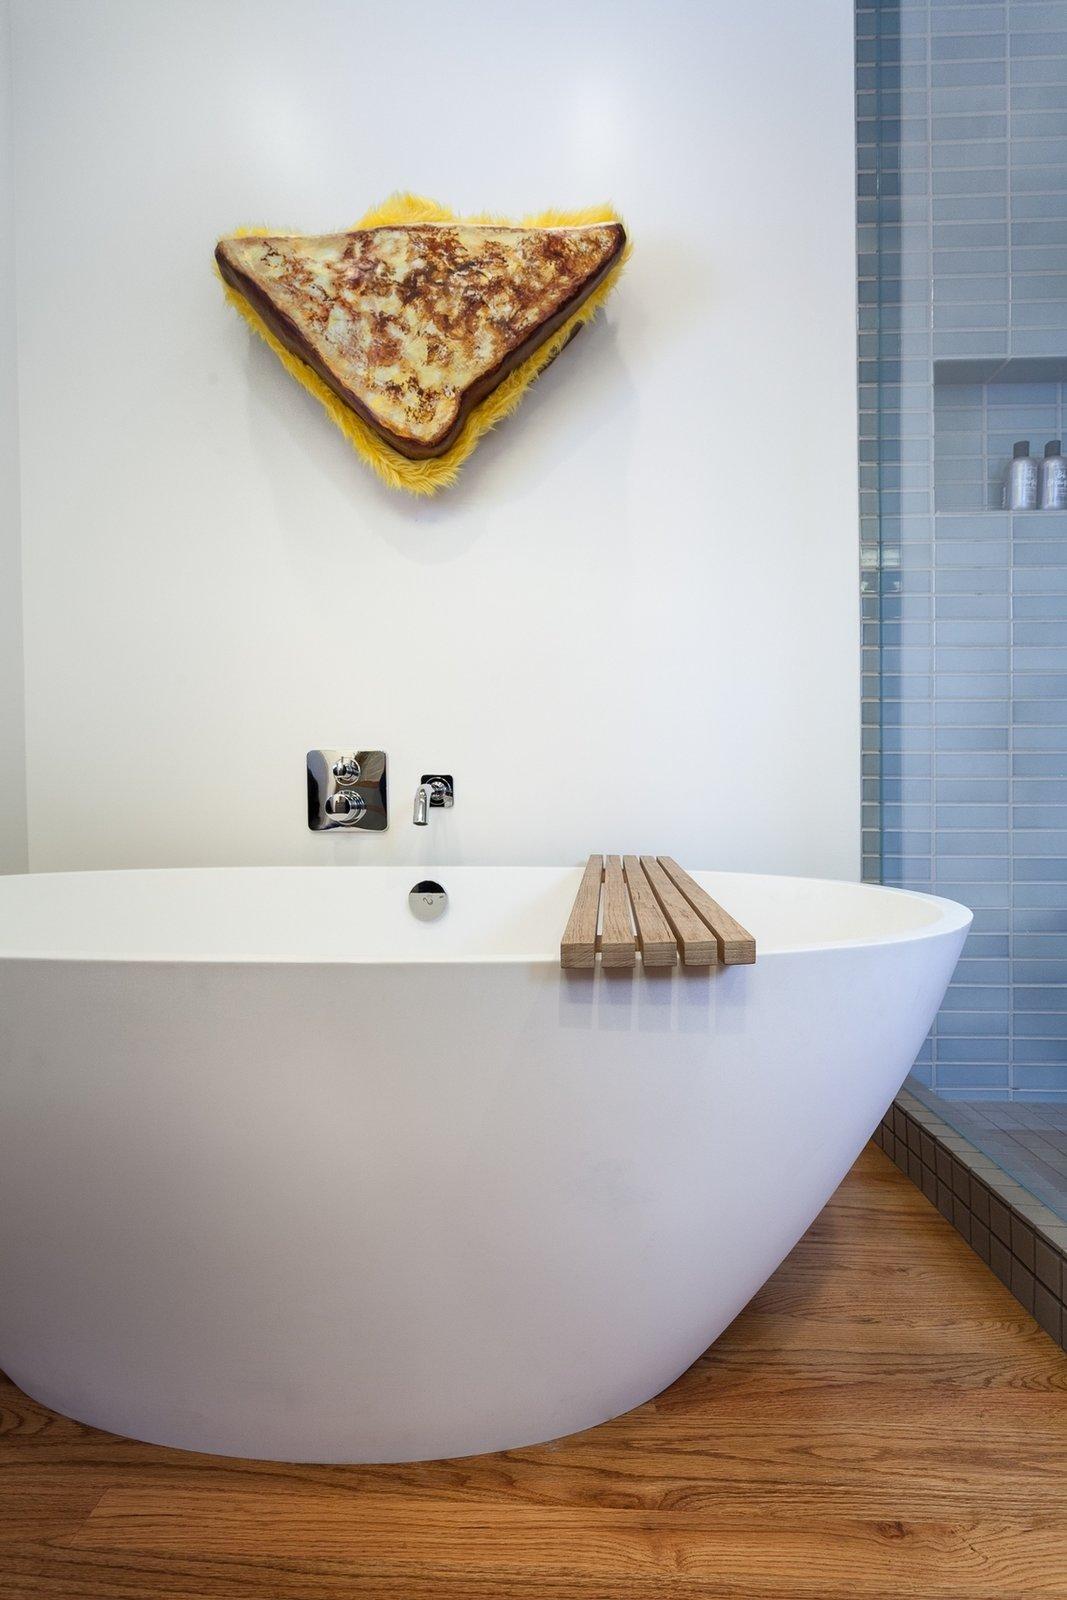 Wood Counter, Medium Hardwood Floor, Vessel Sink, Enclosed Shower, Ceiling Lighting, Recessed Lighting, Freestanding Tub, Corner Shower, One Piece Toilet, Wall Lighting, Ceramic Tile Wall, and Bath Room Master  South Land Park